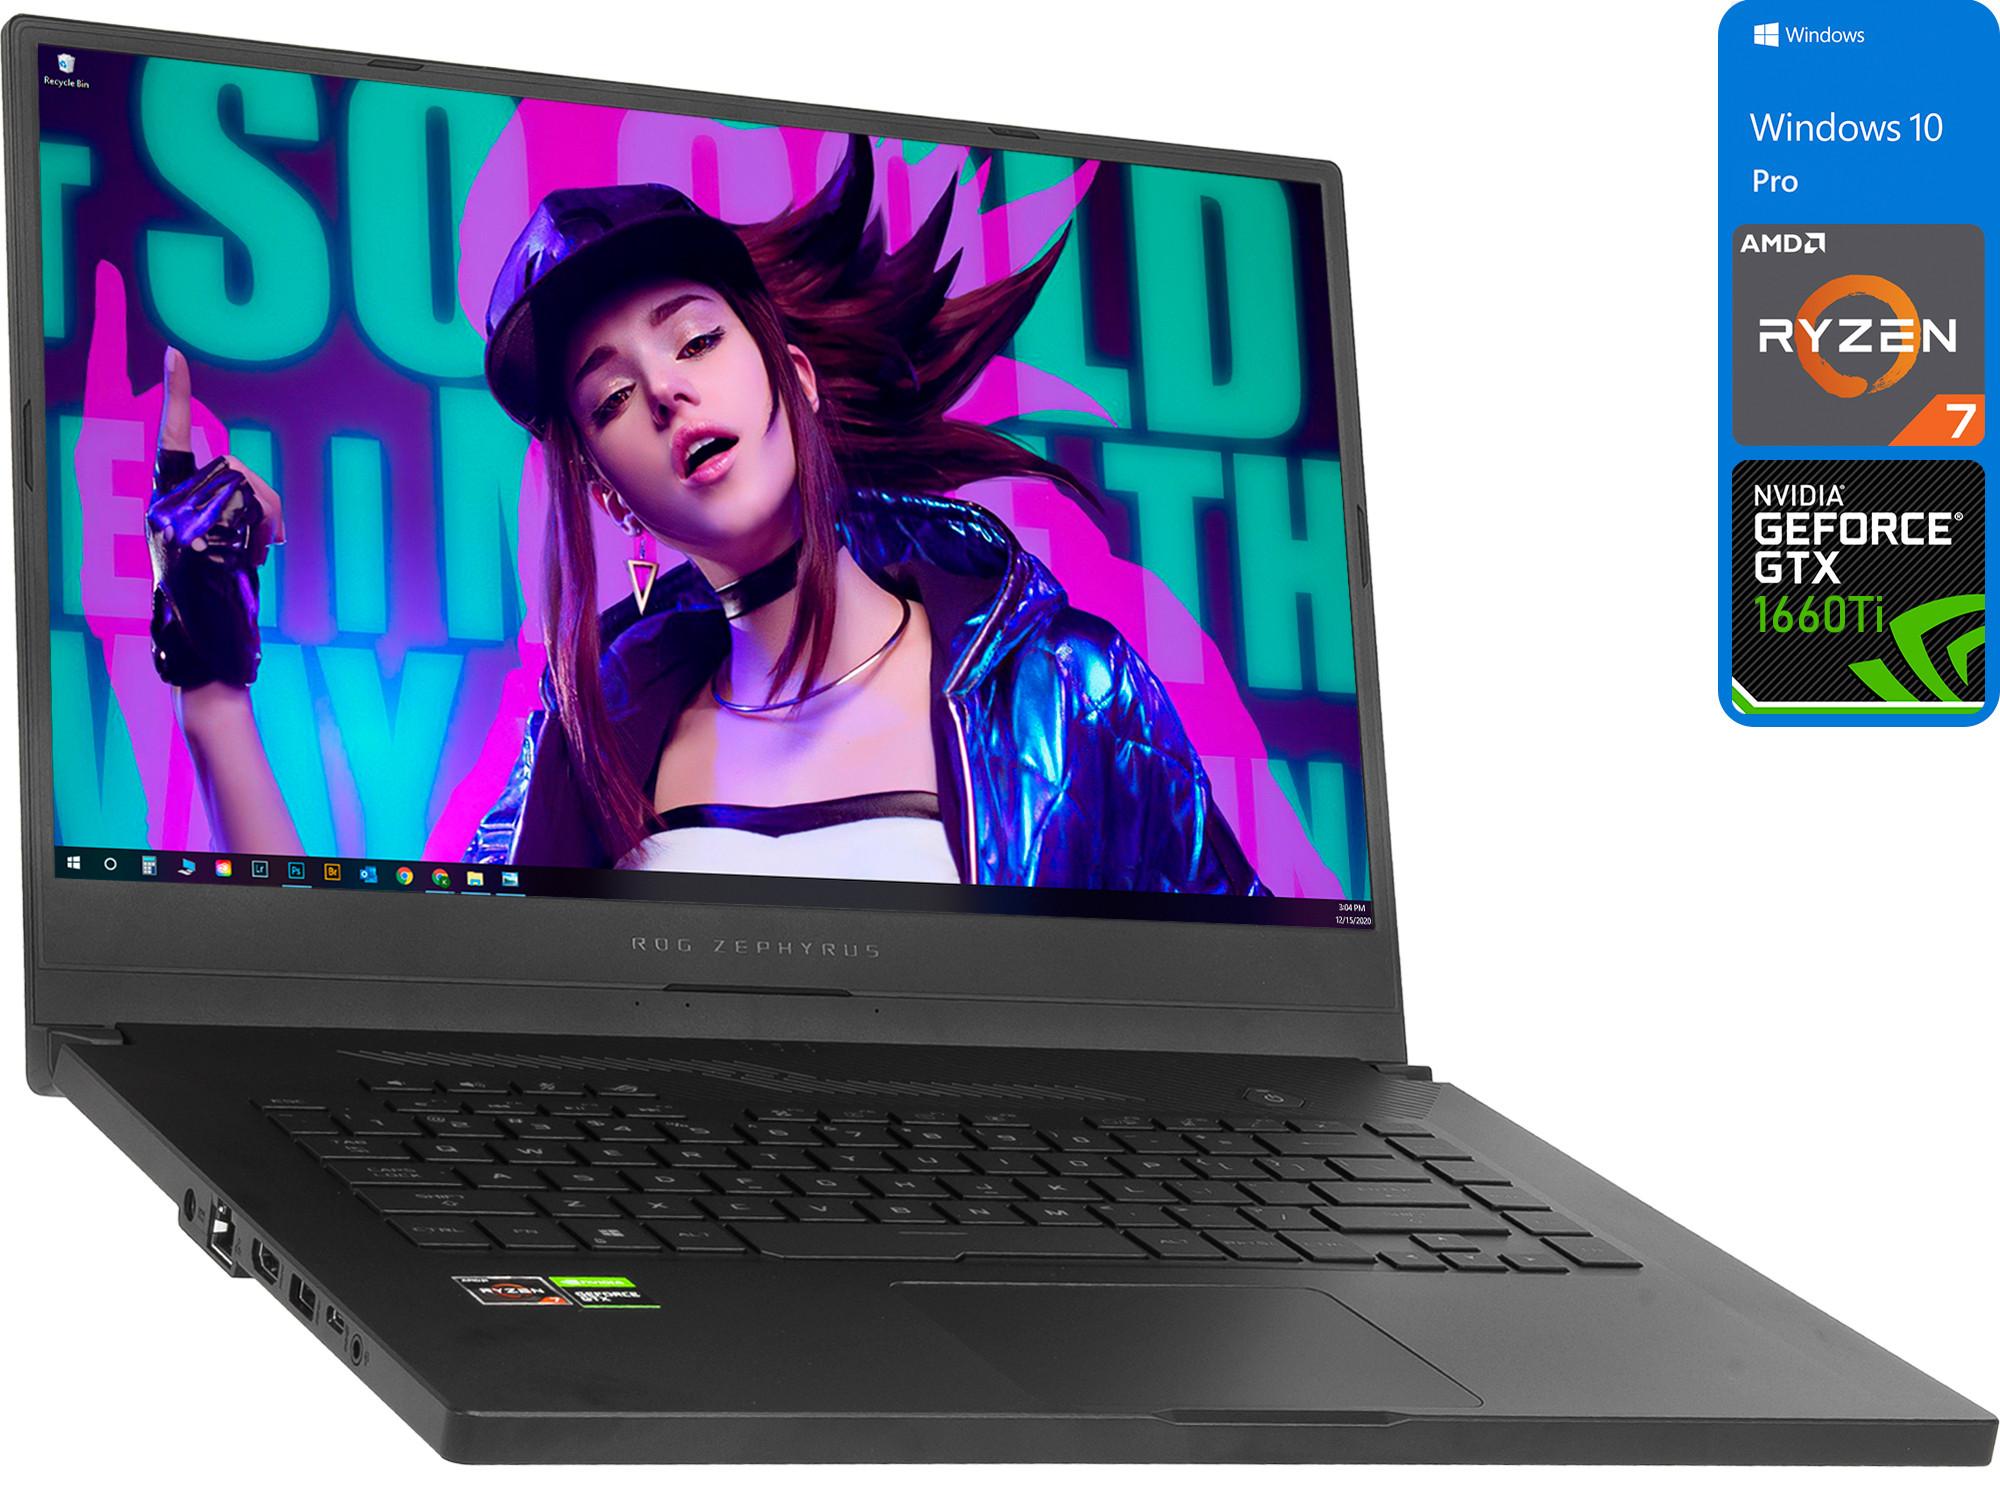 ASUS ROG Zephyrus G15 15.6″ 144Hz Gaming Laptop, AMD Ryzen 7, 8GB RAM, 256GB